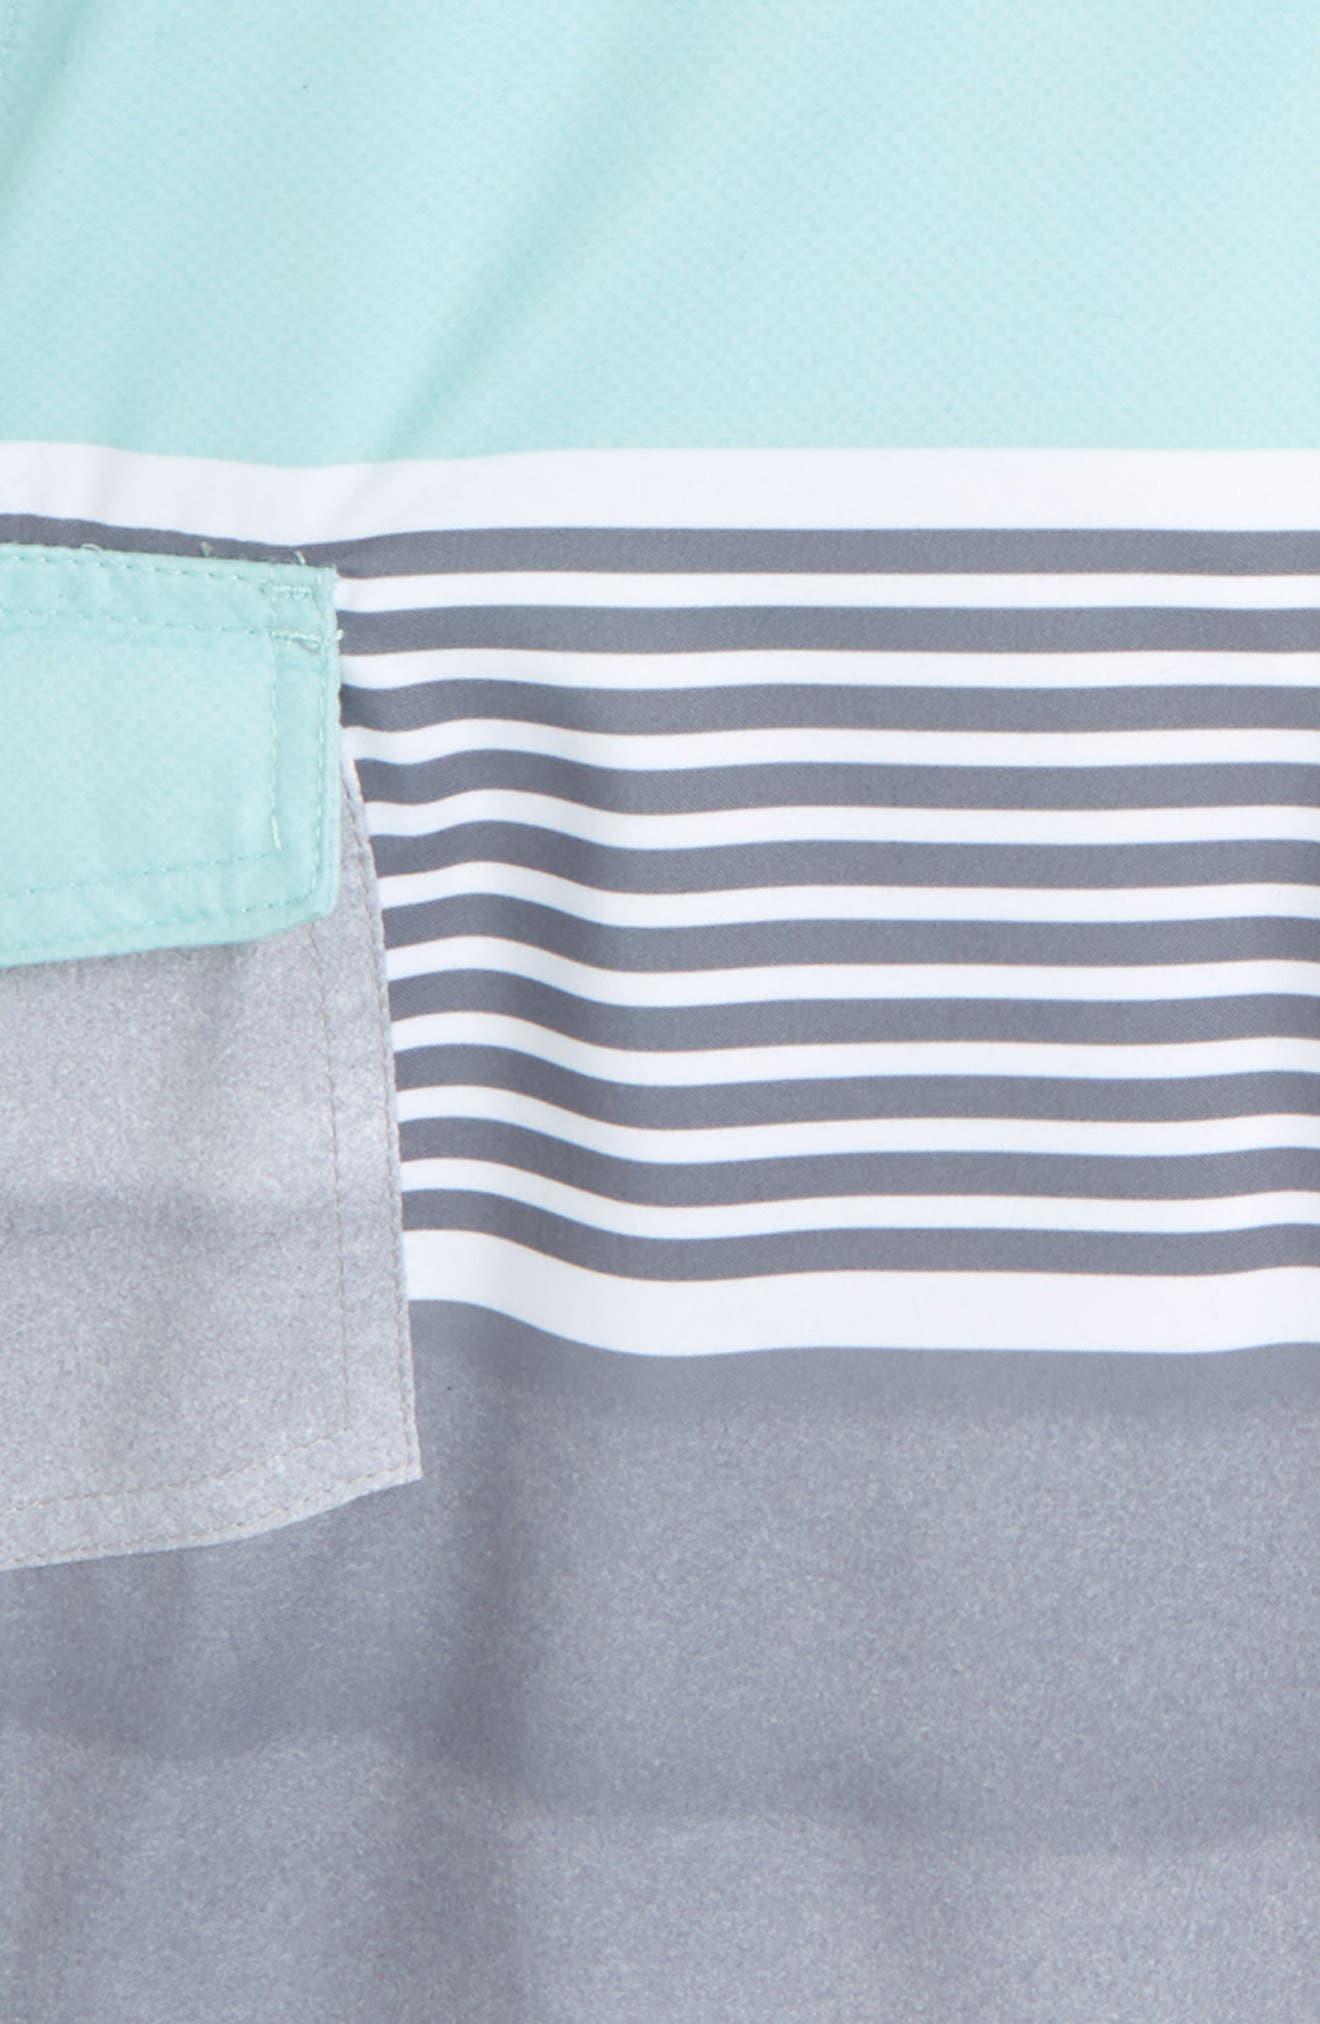 Division Board Shorts,                             Alternate thumbnail 2, color,                             Eggshell Blue